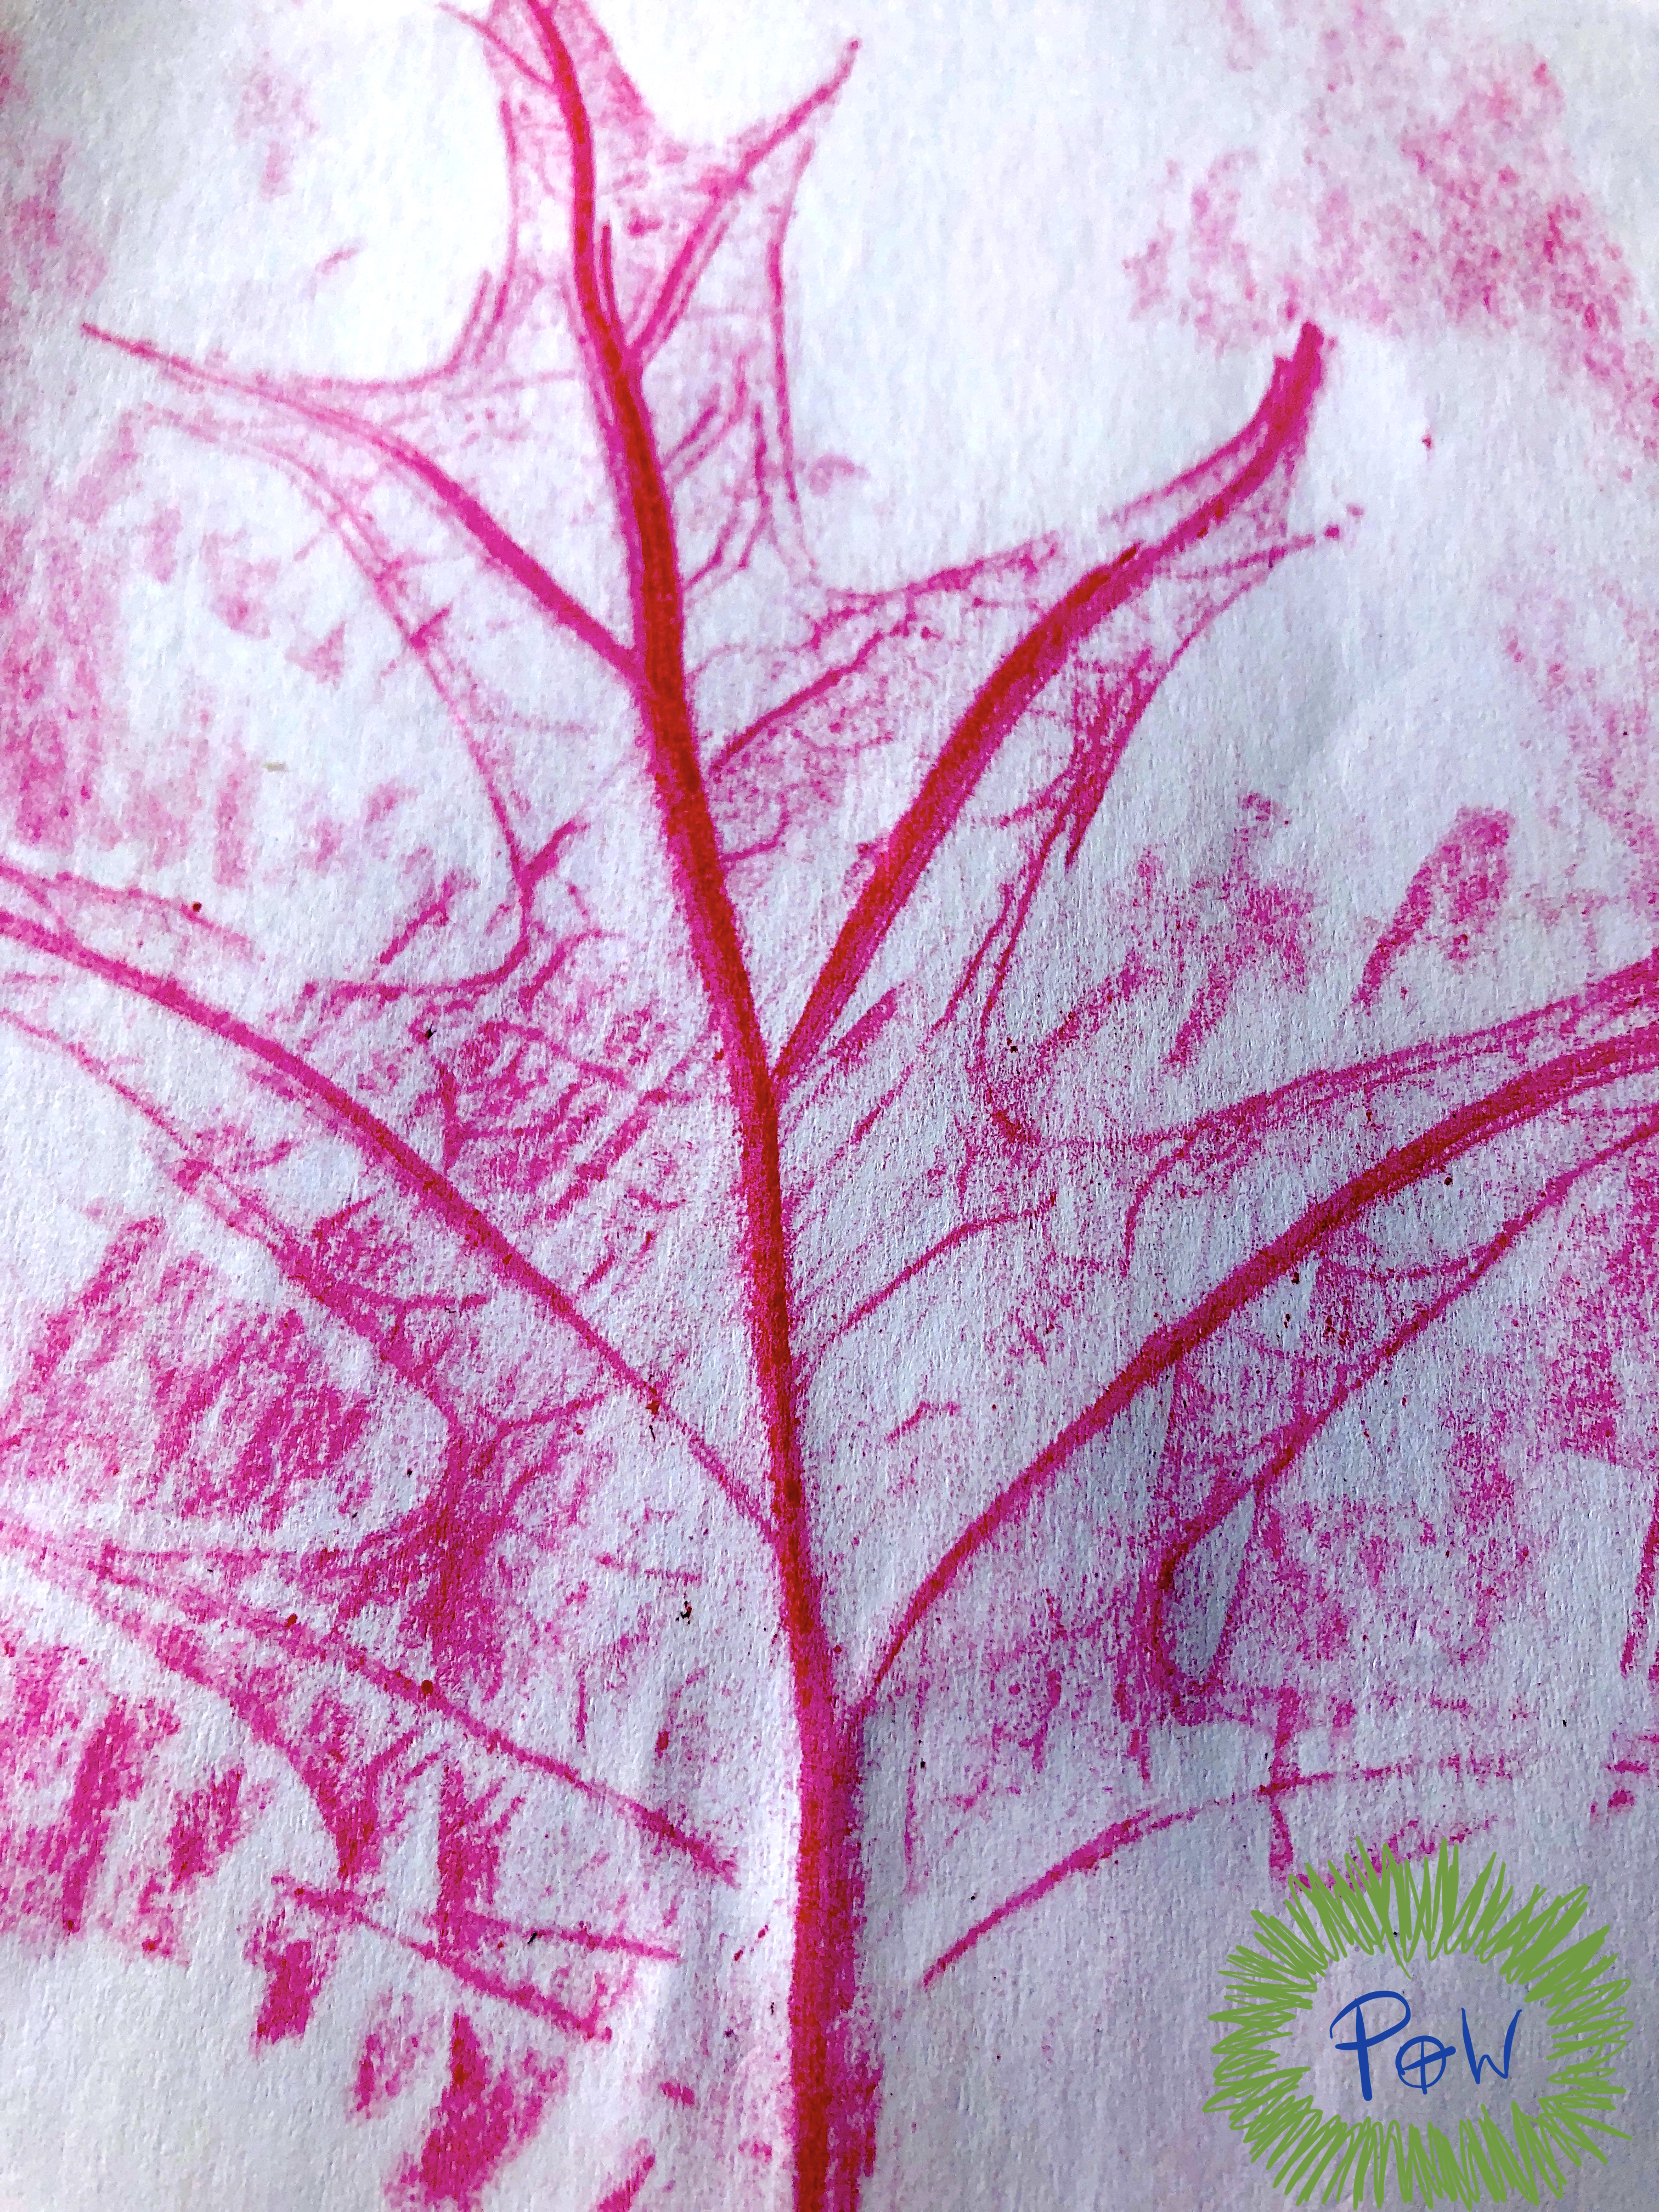 Leaf rubbing with crayons. Autumn leaf activity for children. EYFS Mark Making Ideas & Activities that Help Children.